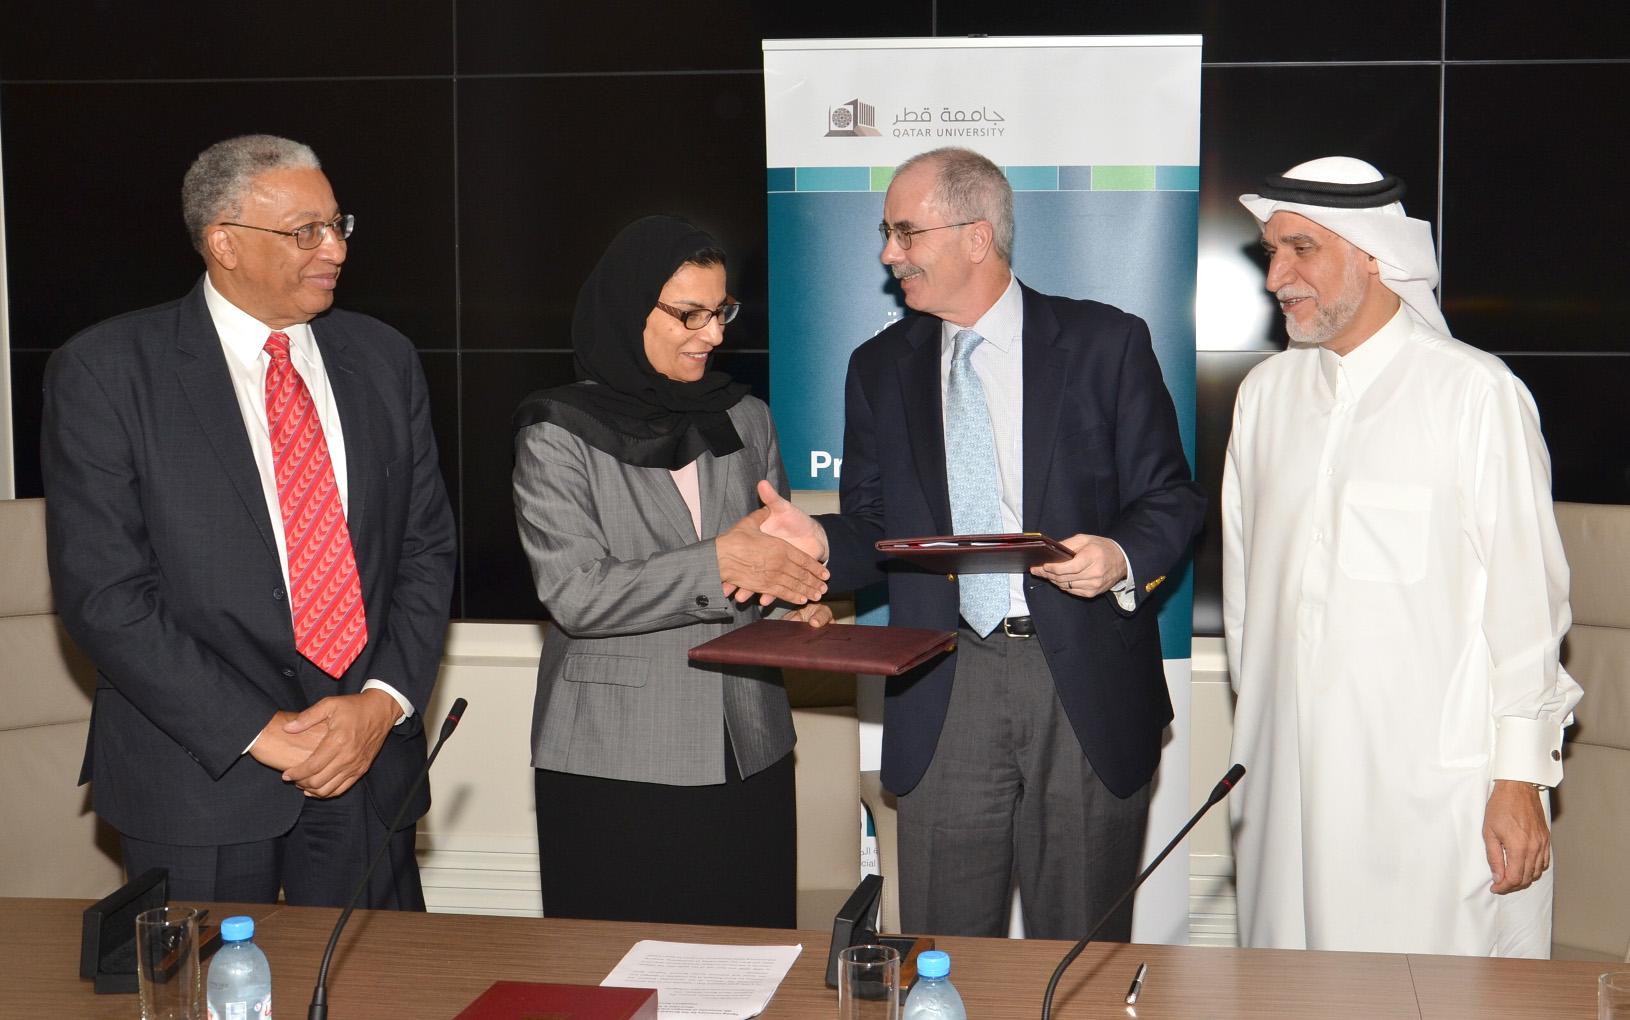 Prof Jackson, Prof Al Misnad, Prof Hanlon and Dr Al-Emadi